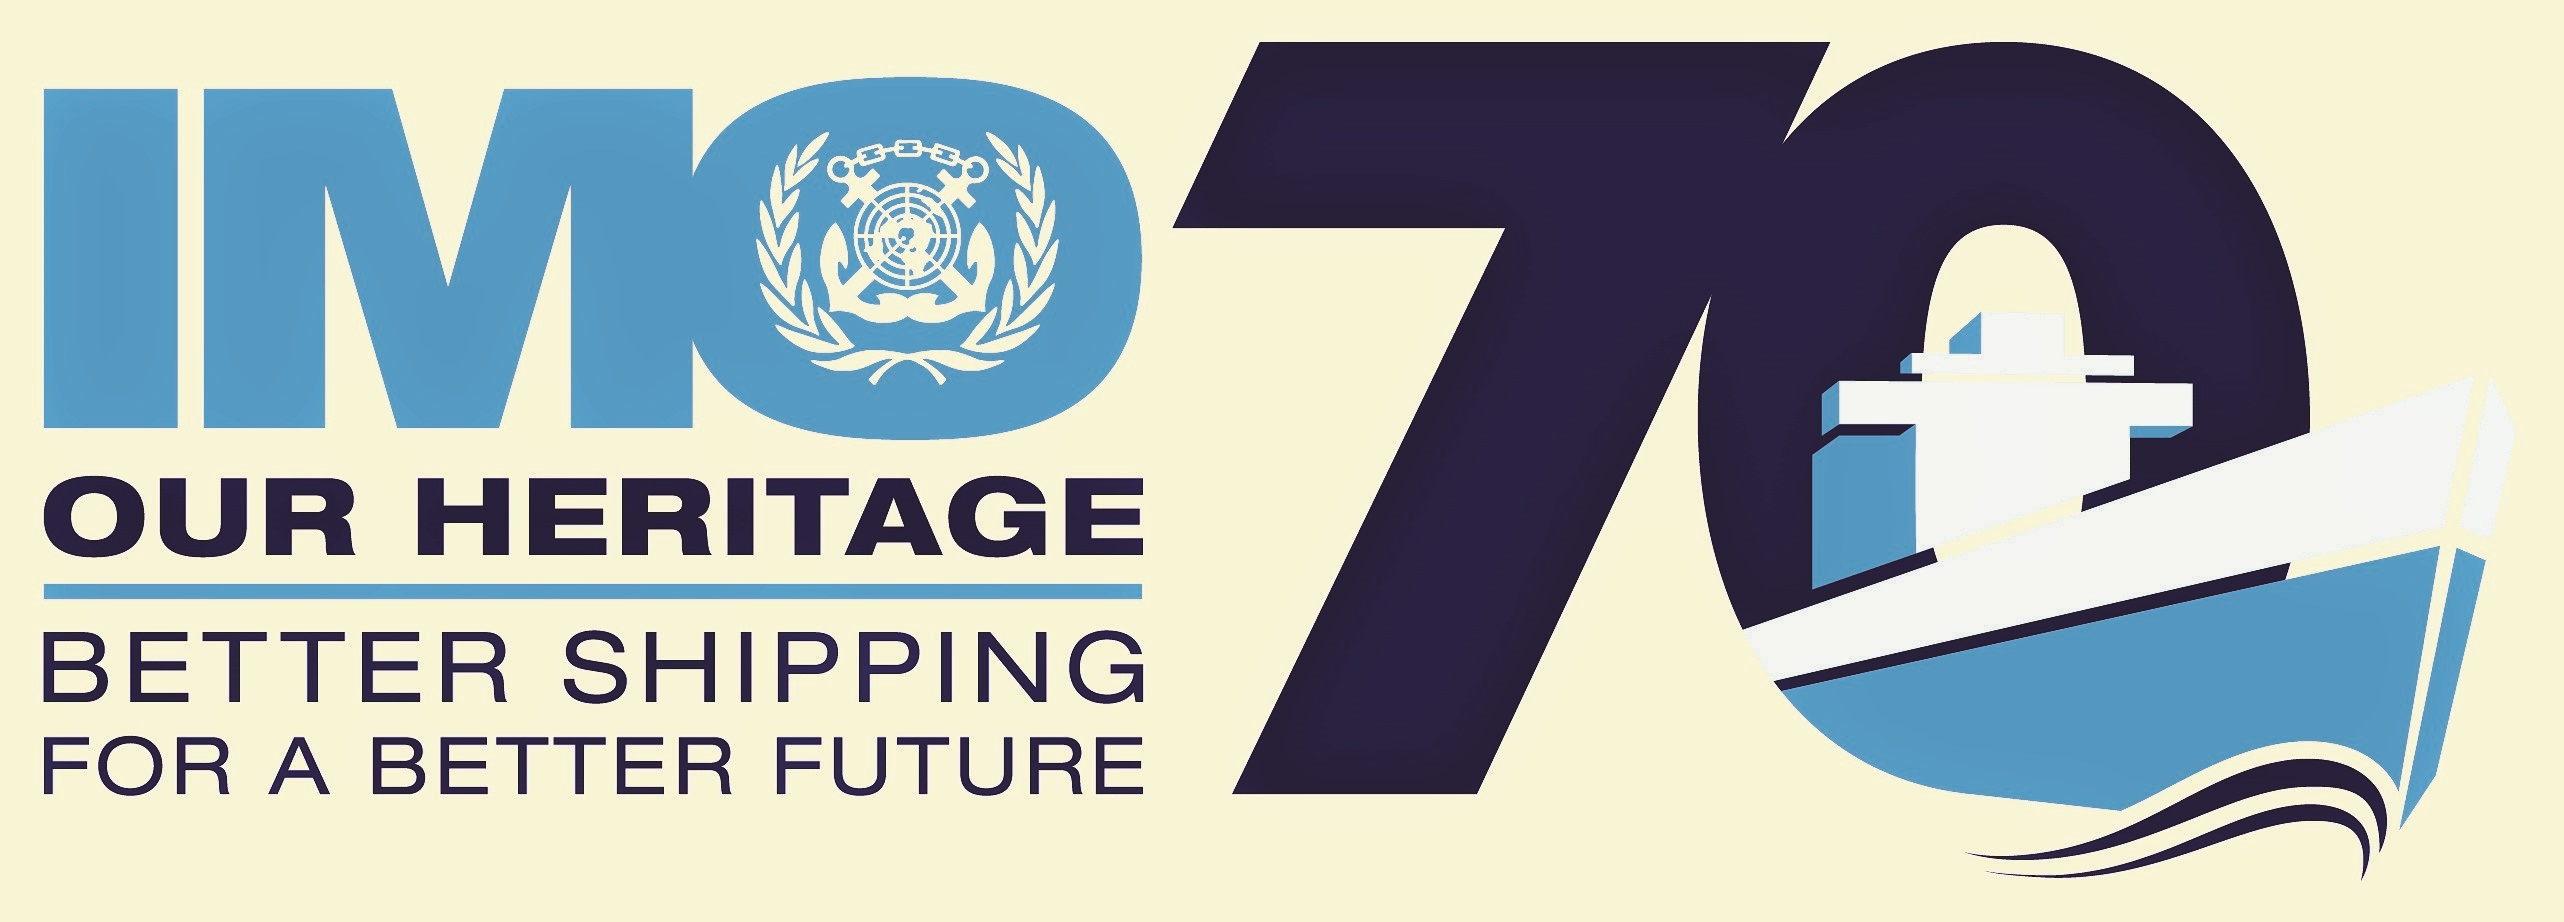 V2033 IMO 70 Logo-English version_NEW_2 f.jpg